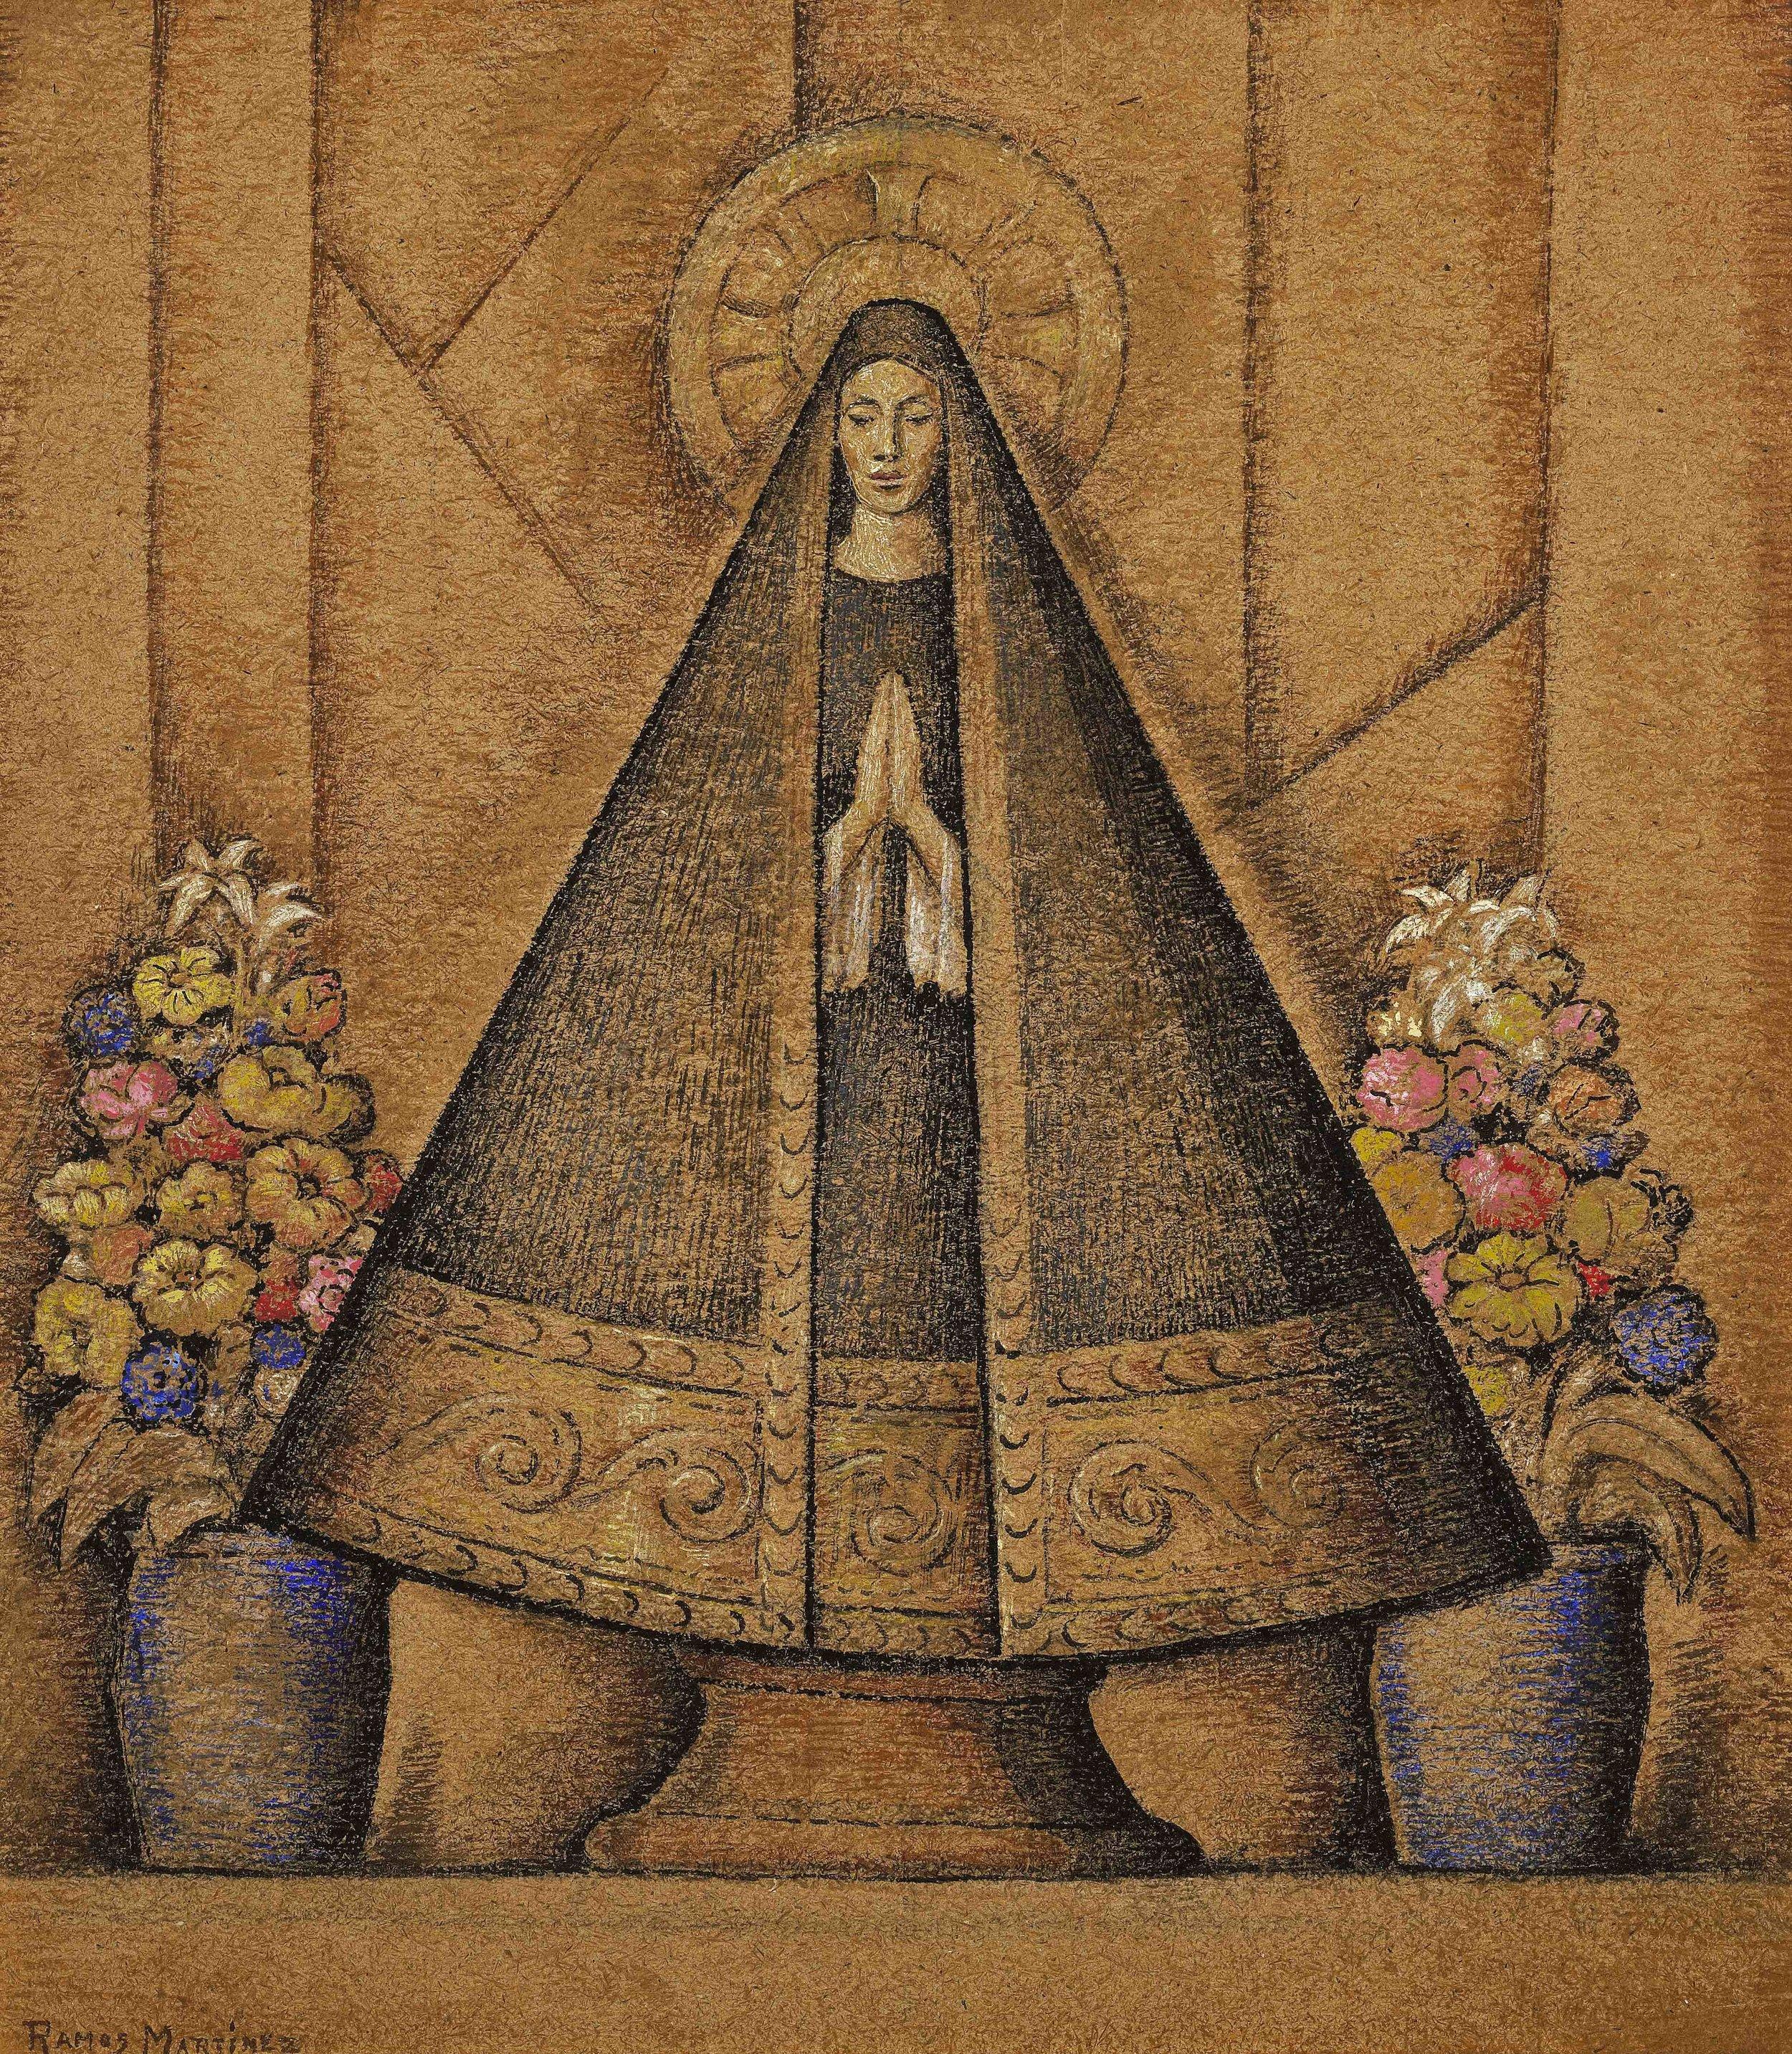 La Virgen de San Juan / Virgin of San Juan  ca. 1940 oil on pressed board / óleo sobre tabla comprimida 29.3 x 26.3 inches; 74.3 x 66.7 centímetros Santa Barbara Museum of Art